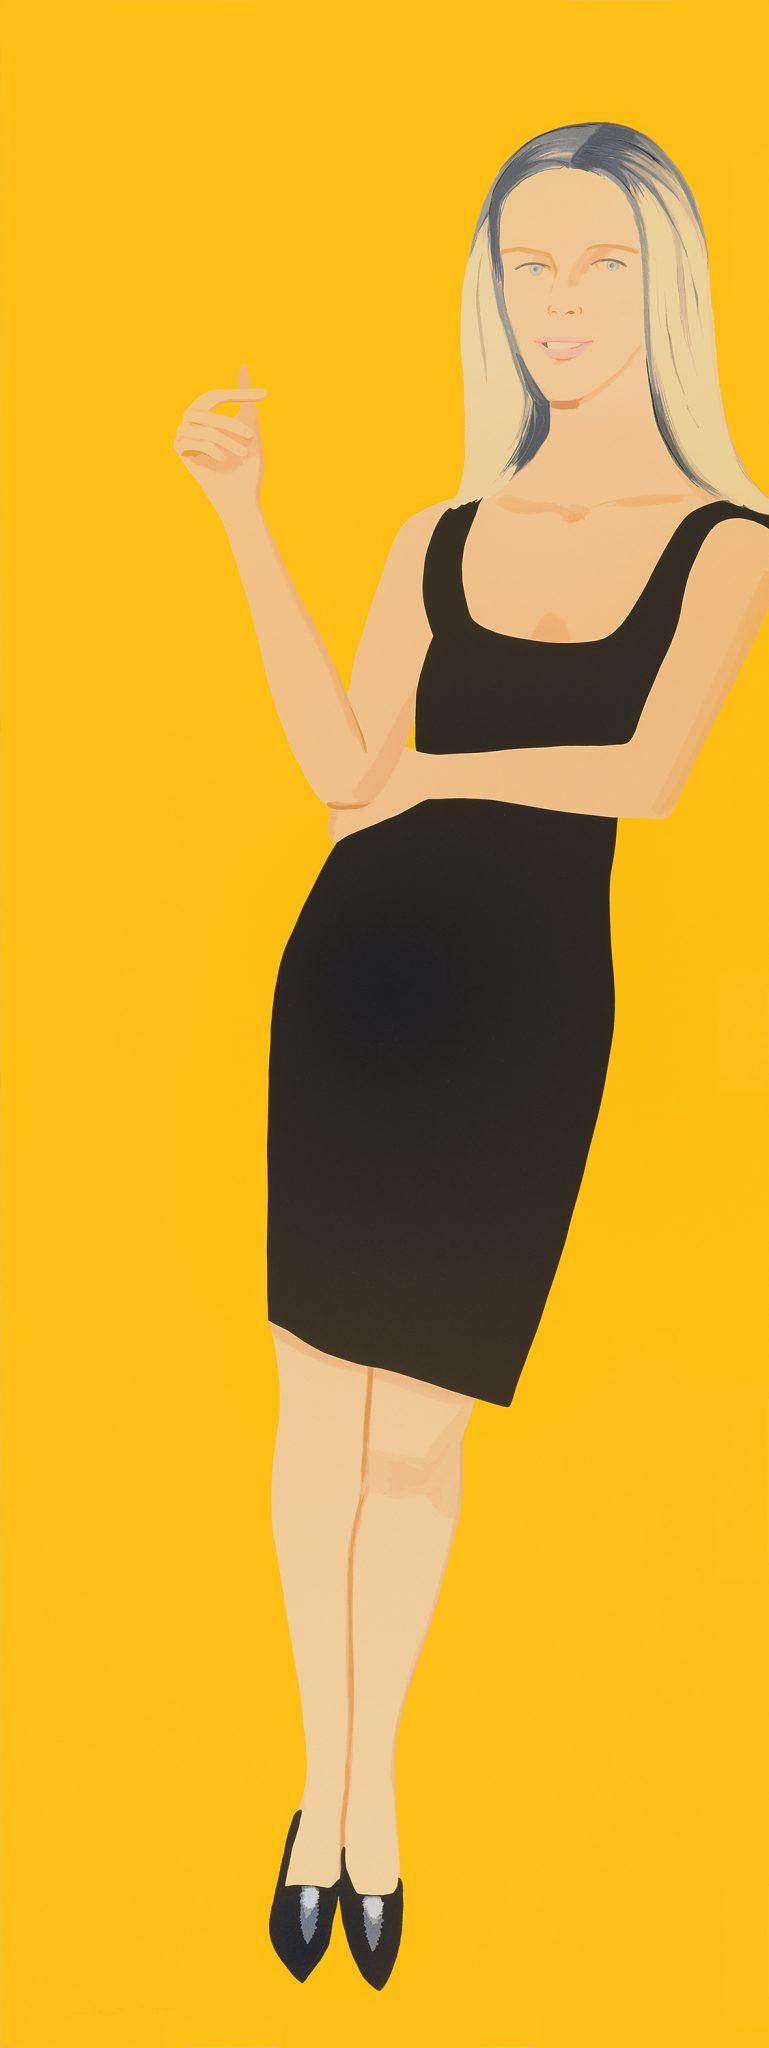 ALEX KATZ Black Dress (Yvonne), 2015